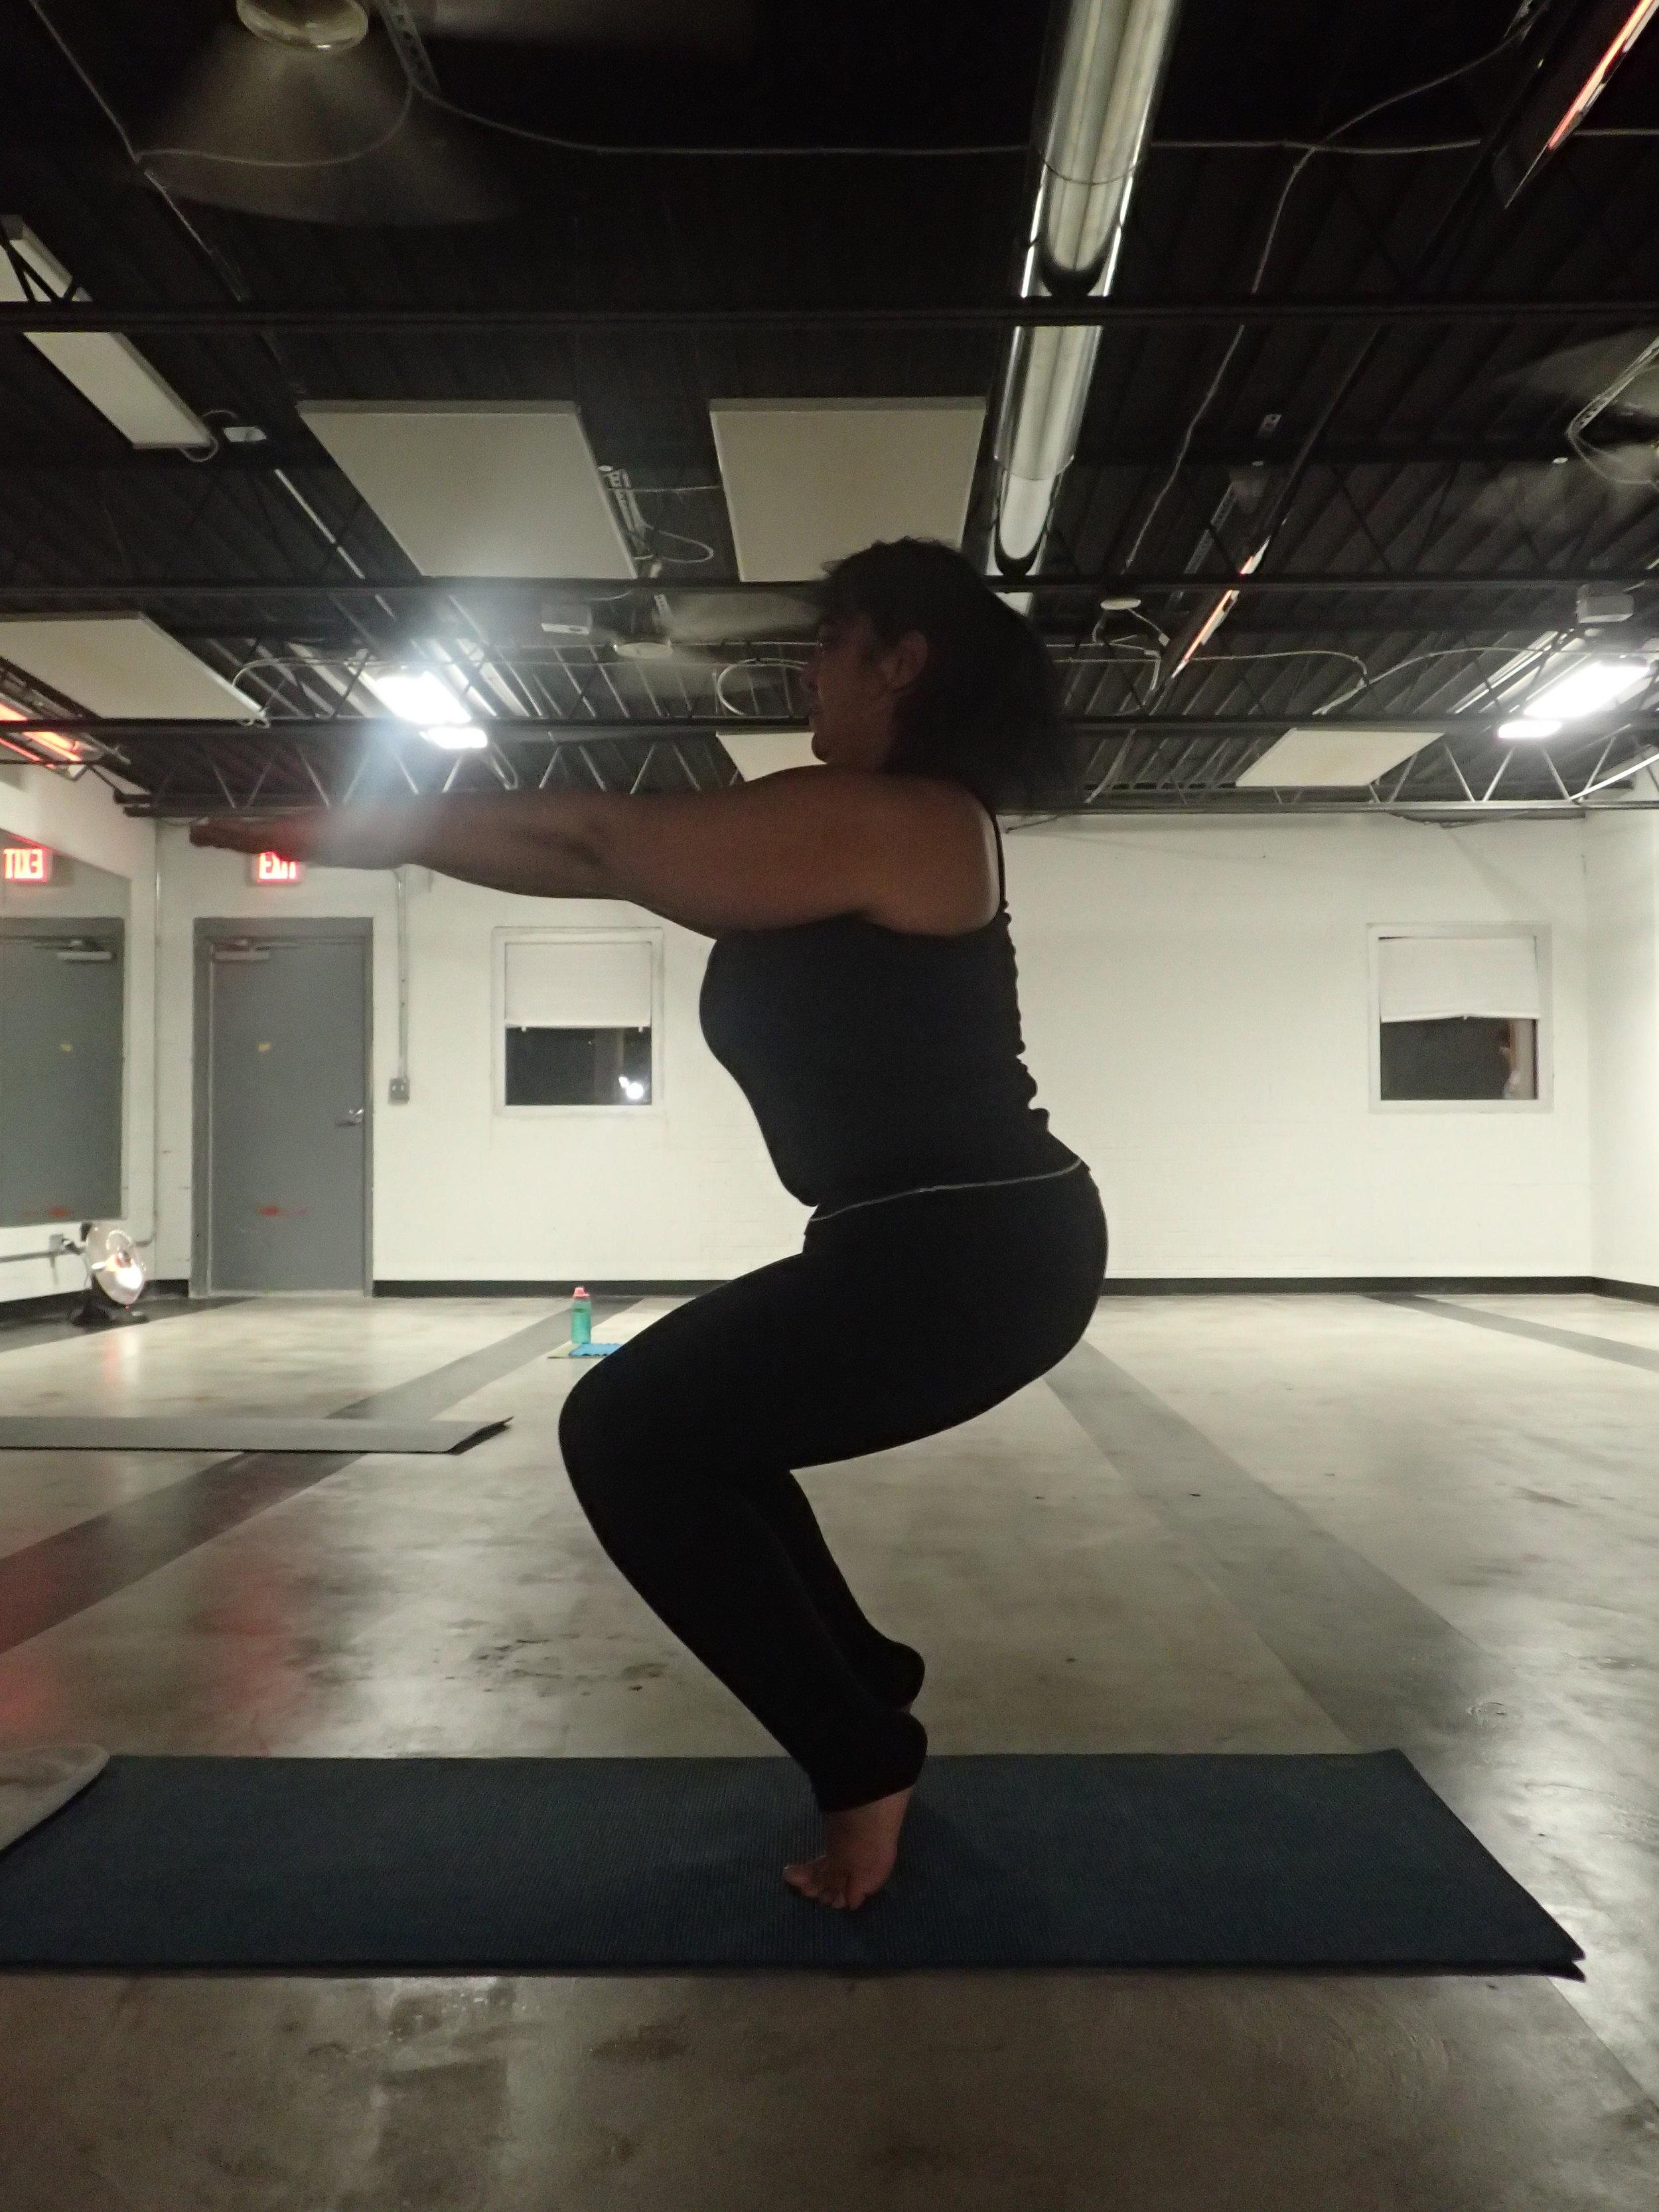 kodawari, bella prana, tampa, yoga loft, satva yoga, evolation, bikram, awkward pose, utkatasana, the body electric, the body aligned, orange theory fitness, elite strength and conditioning, camp tampa, Gaze hot yoga, hot yoga, bikram yoga, ganesha hot yoga st. pete, hot yoga st petersburg, Gambol fitness, tony sanchez